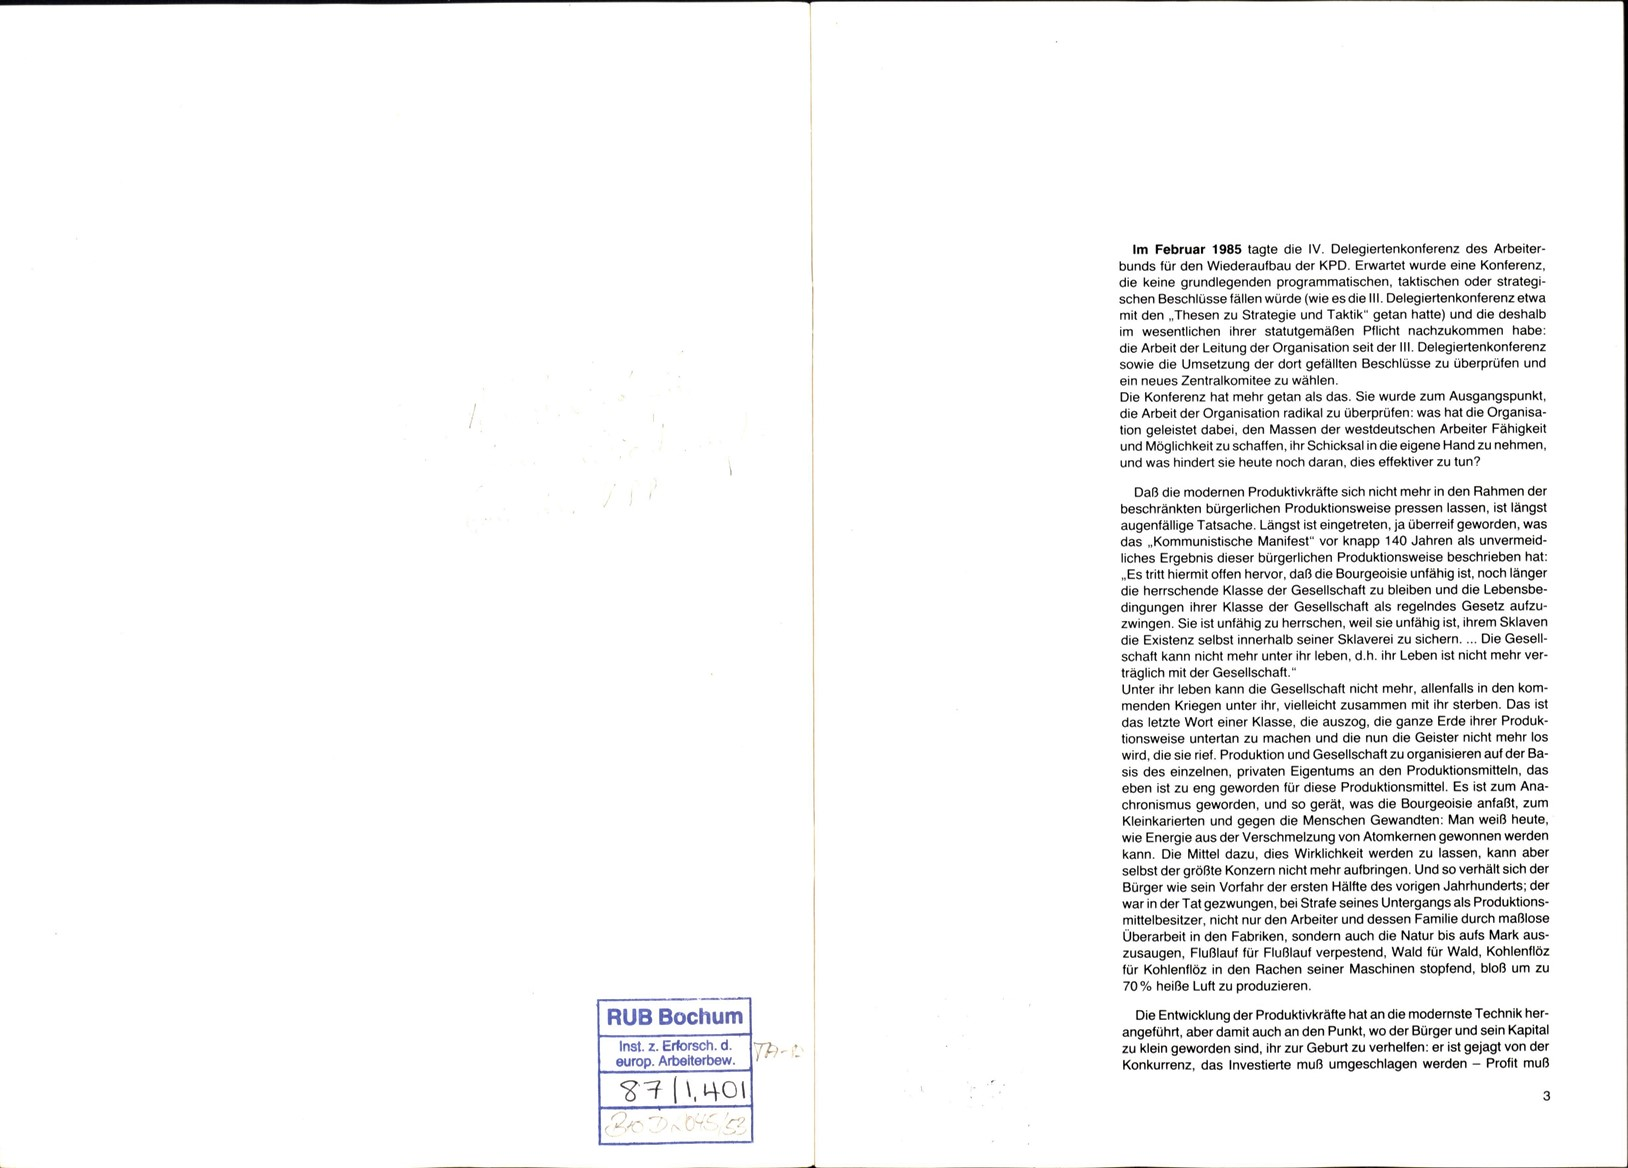 ABG_1985_Beschluesse_IV_Delegiertenkonferenz_03